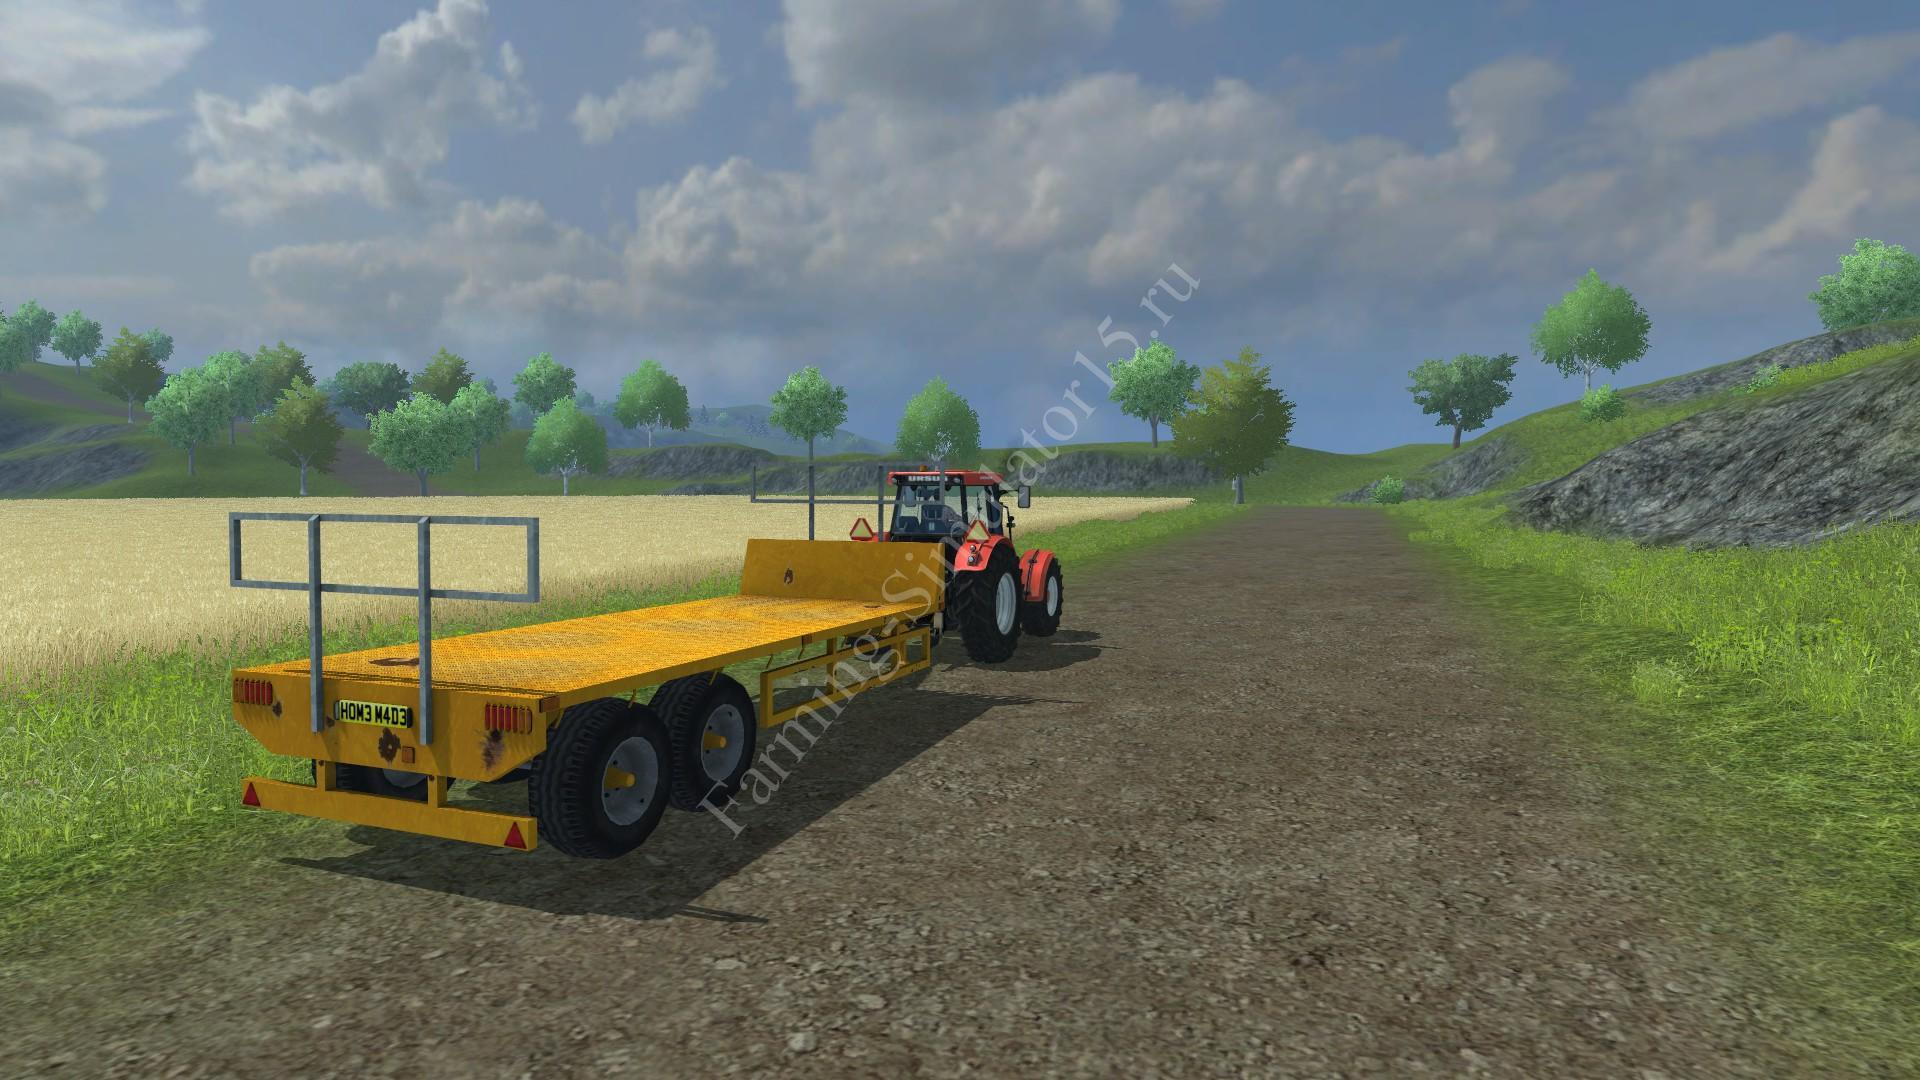 Мод прицепа для тюков Homemade Flatbed Trailer v 1.0 Farming Simulator 2013, Farming Simulator 13